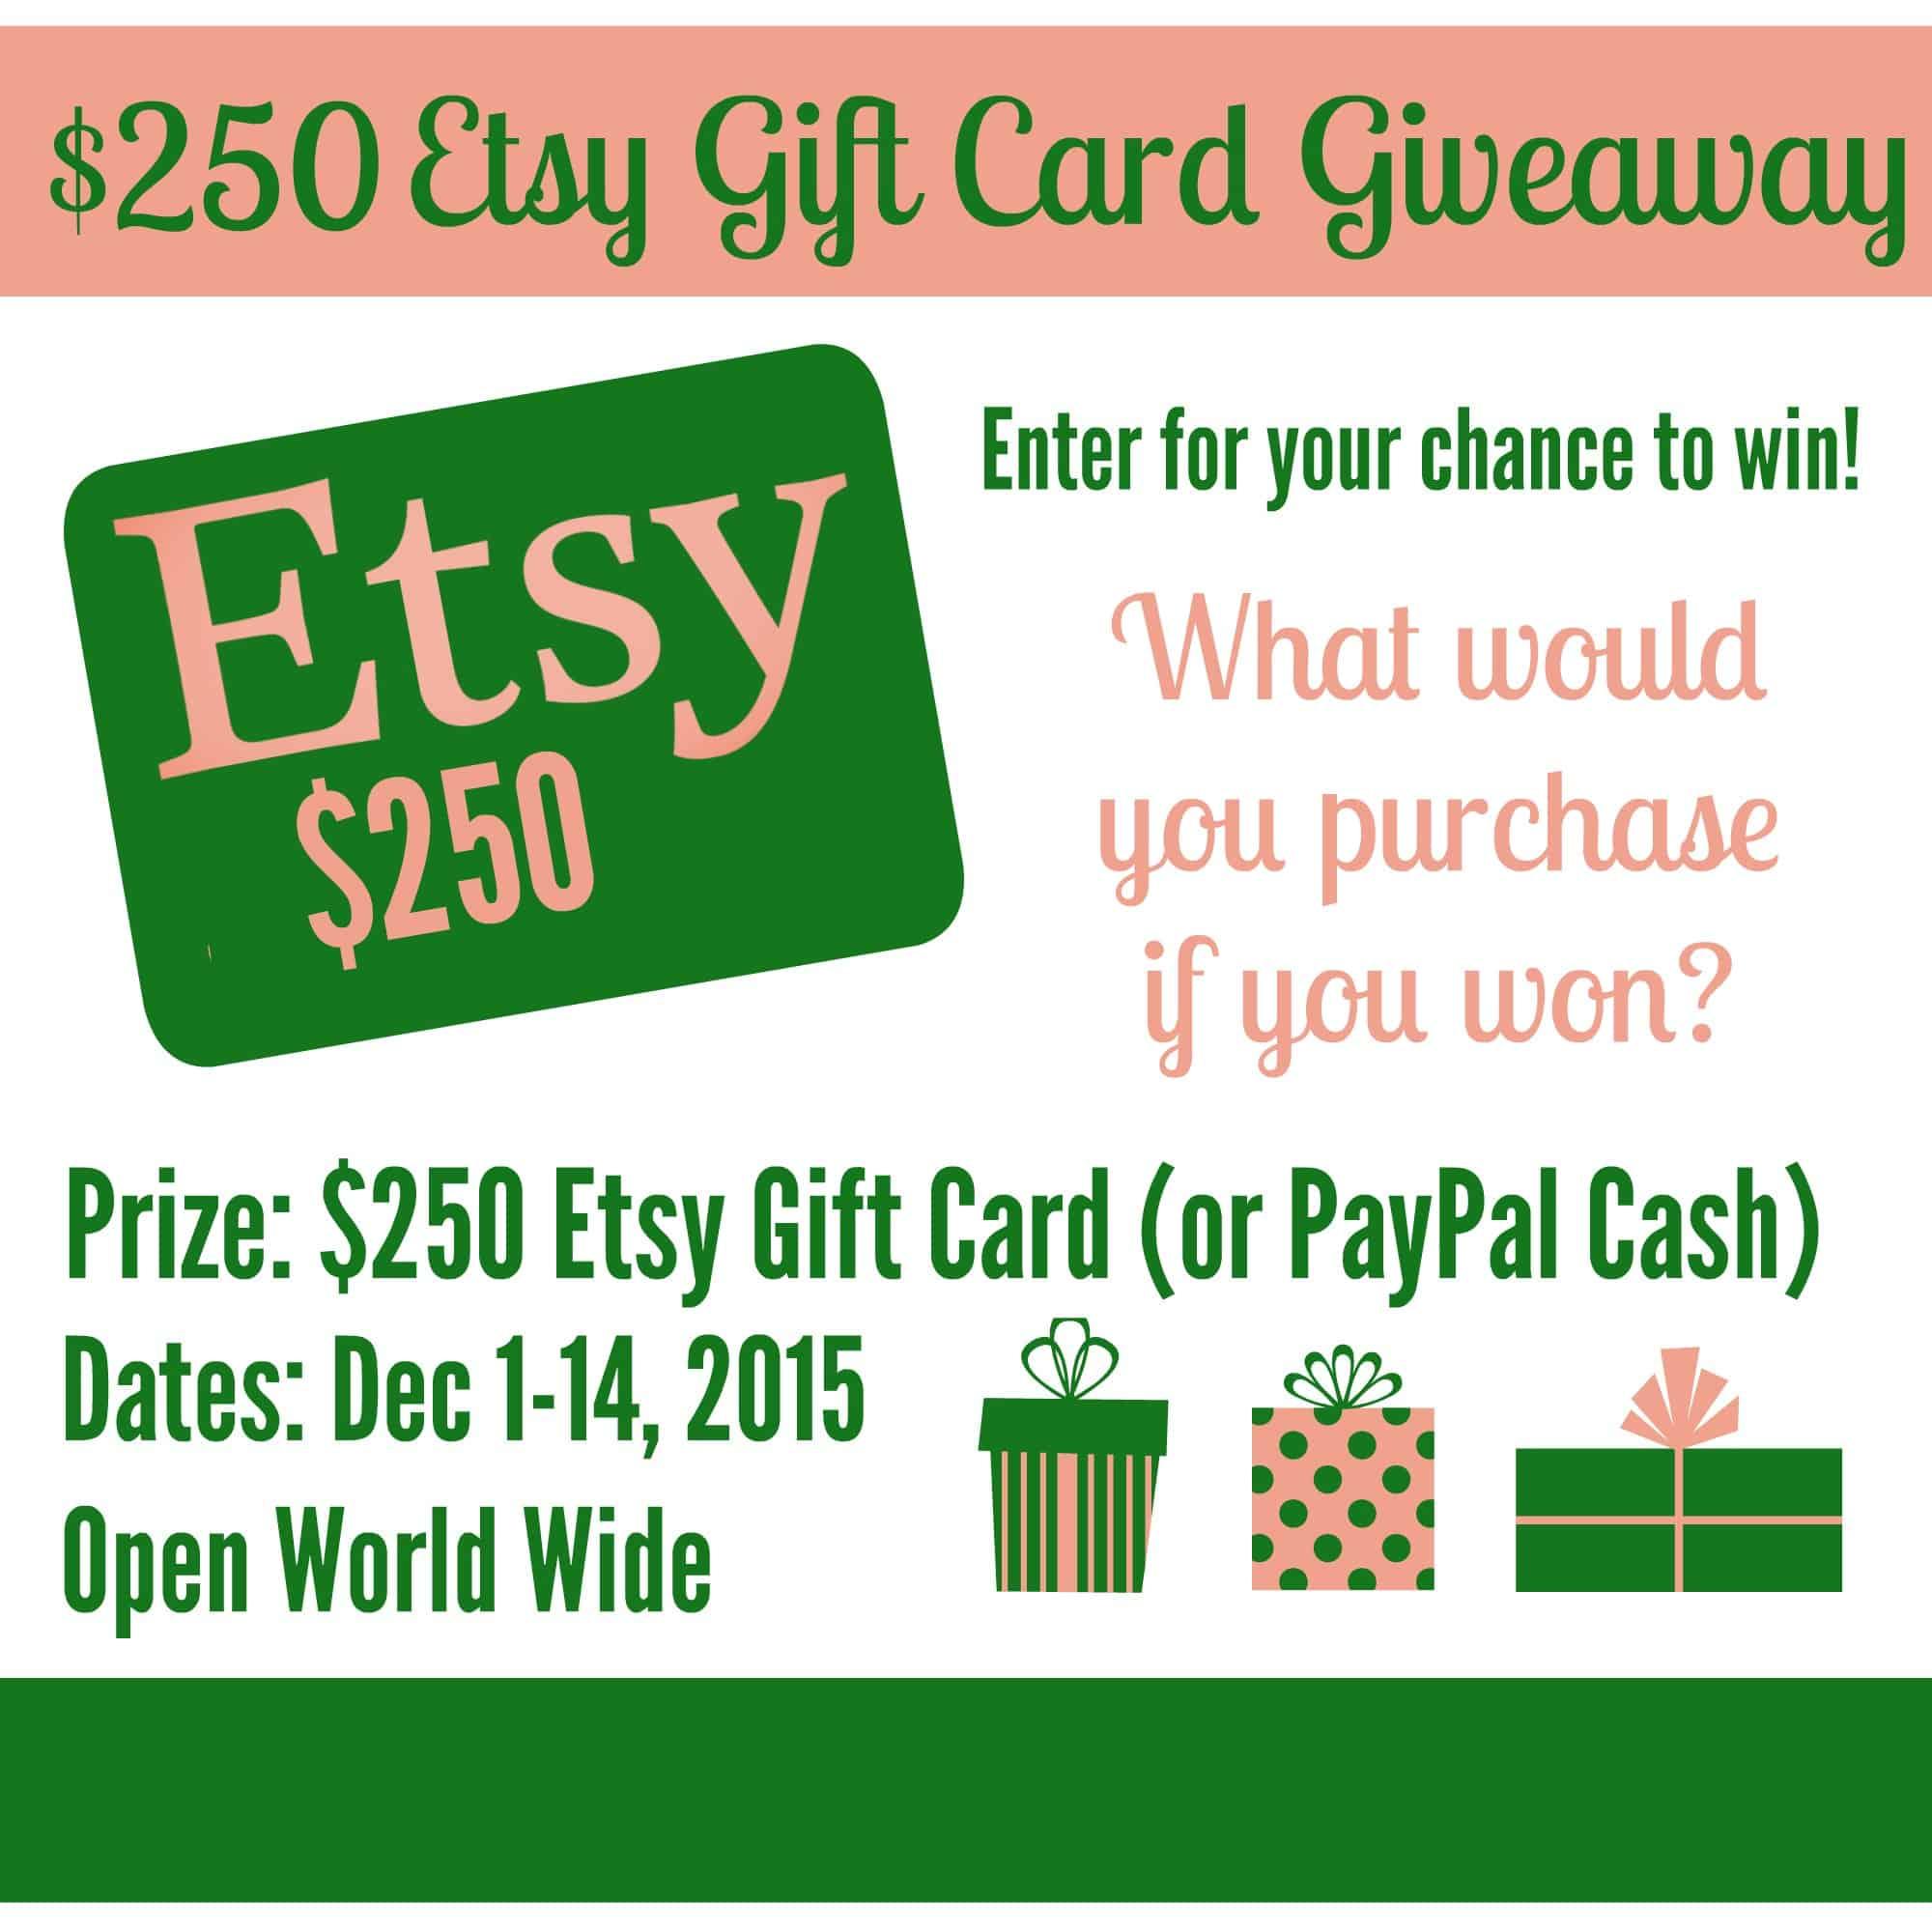 Etsy Giveaway participants